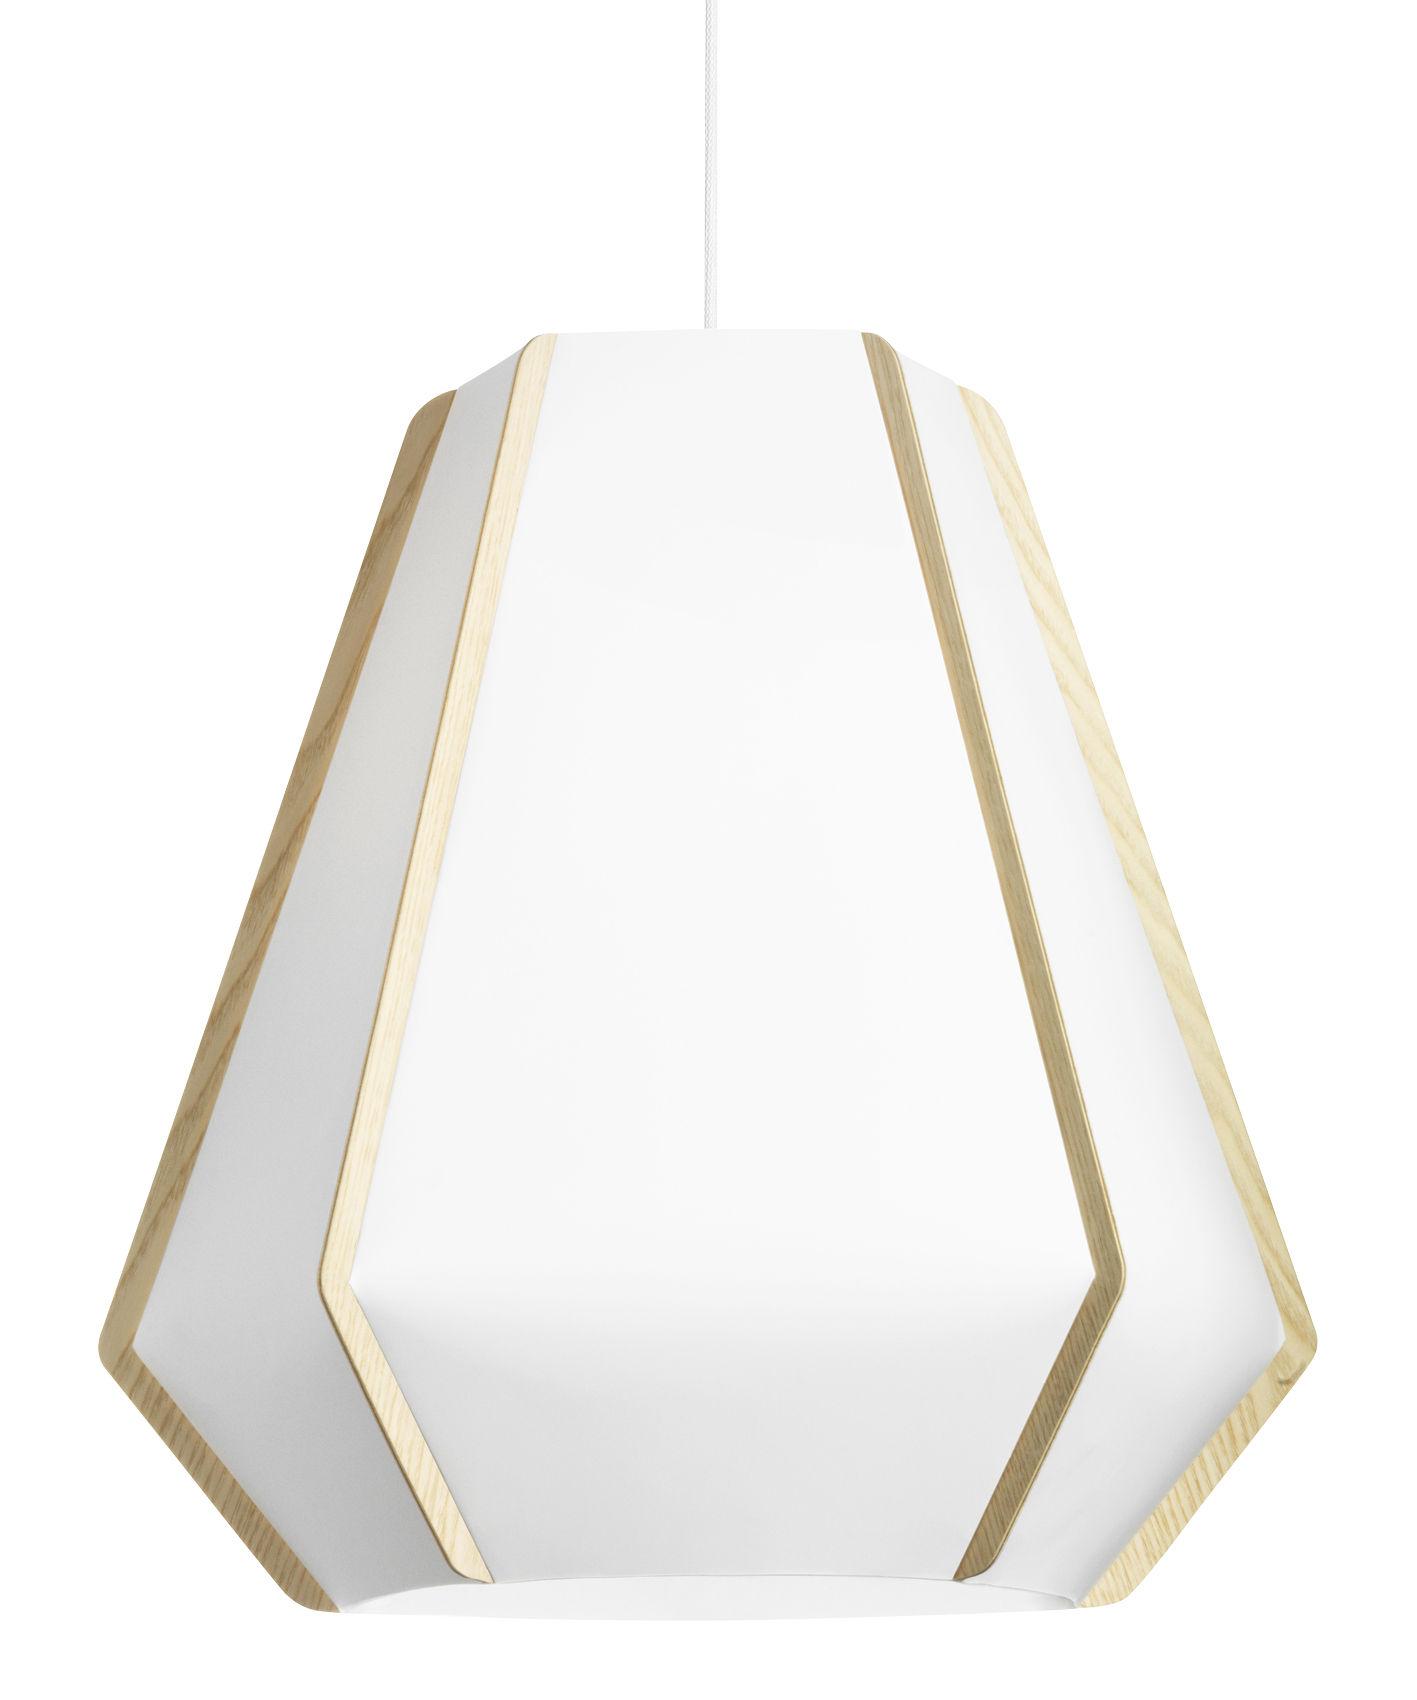 Luminaire - Suspensions - Suspension Lullaby P3 / Ø 59 x H 56 cm - Lightyears - Blanc / Frêne - Frêne, Papier de pierre